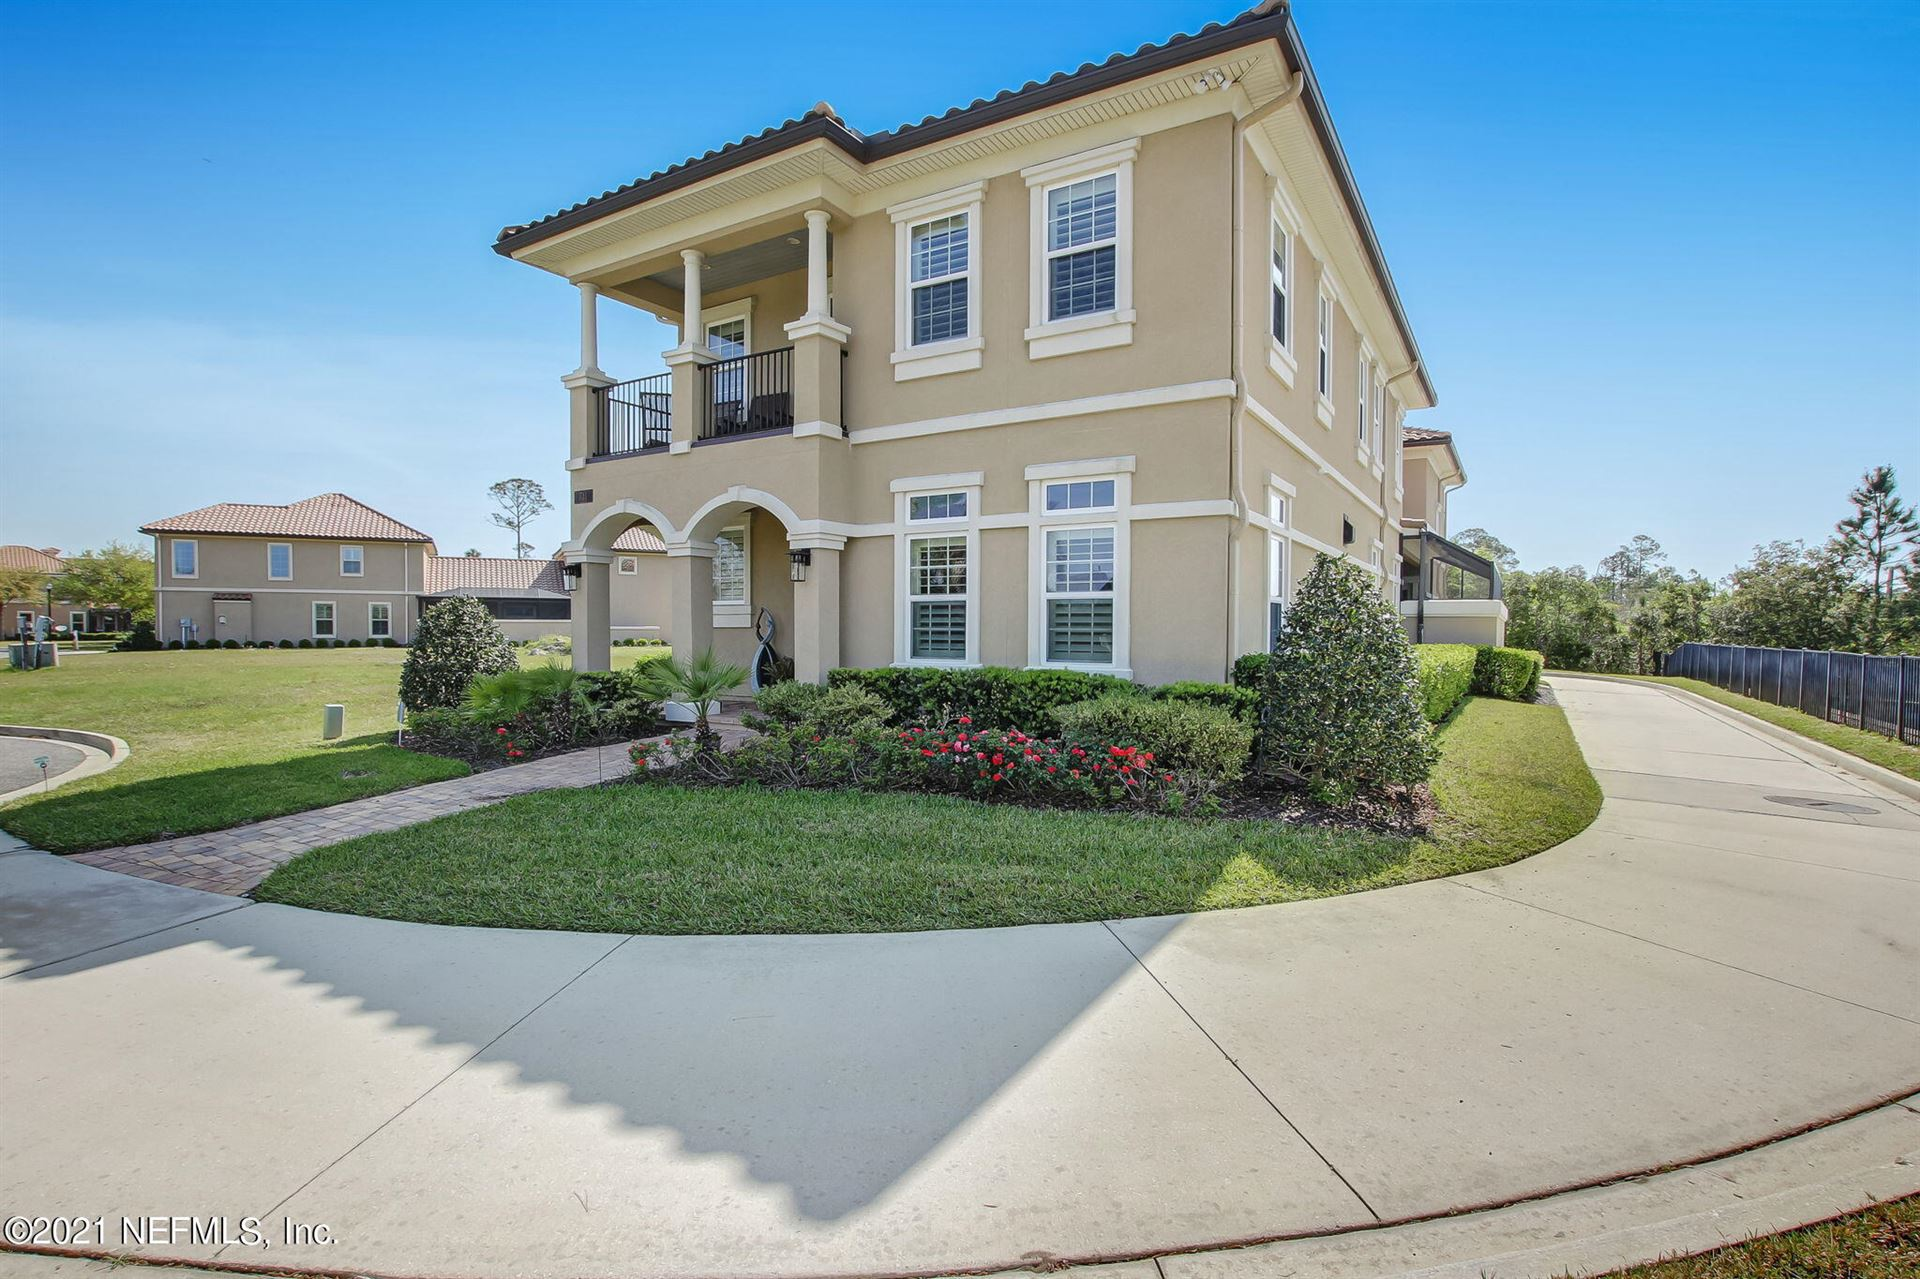 741 PROVIDENCE ISLAND CT #Lot No: 19A, Jacksonville, FL 32225 - MLS#: 1104051